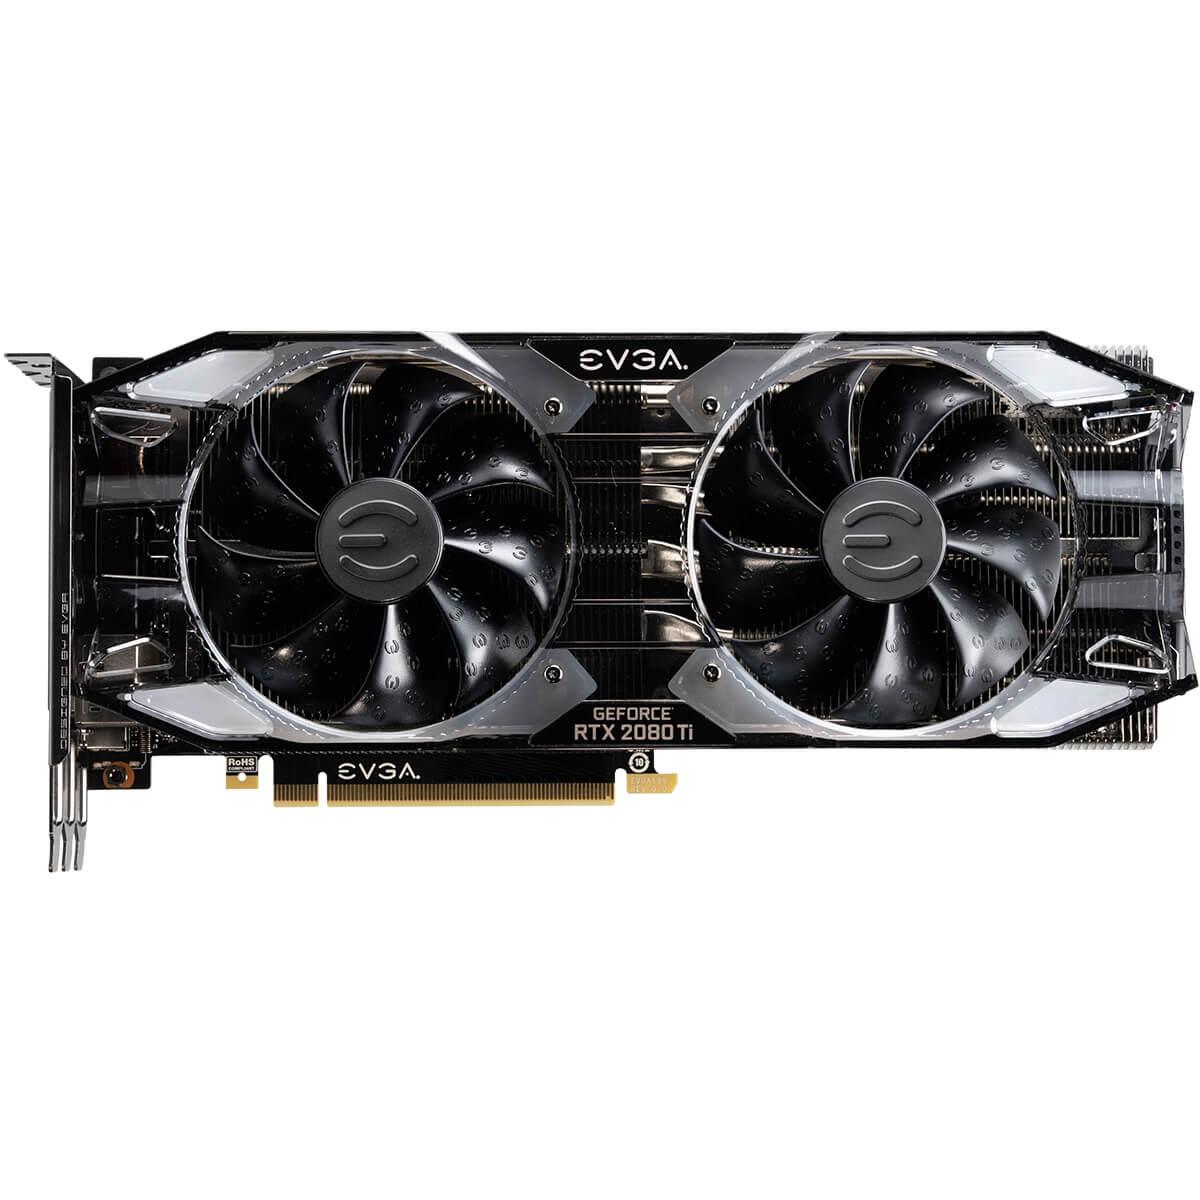 Placa Video EVGA GeForce RTX 2080 Ti XC ULTRA GAMING 11GB GDDR6 Dual HDB Fans & RGB LED 352 biti